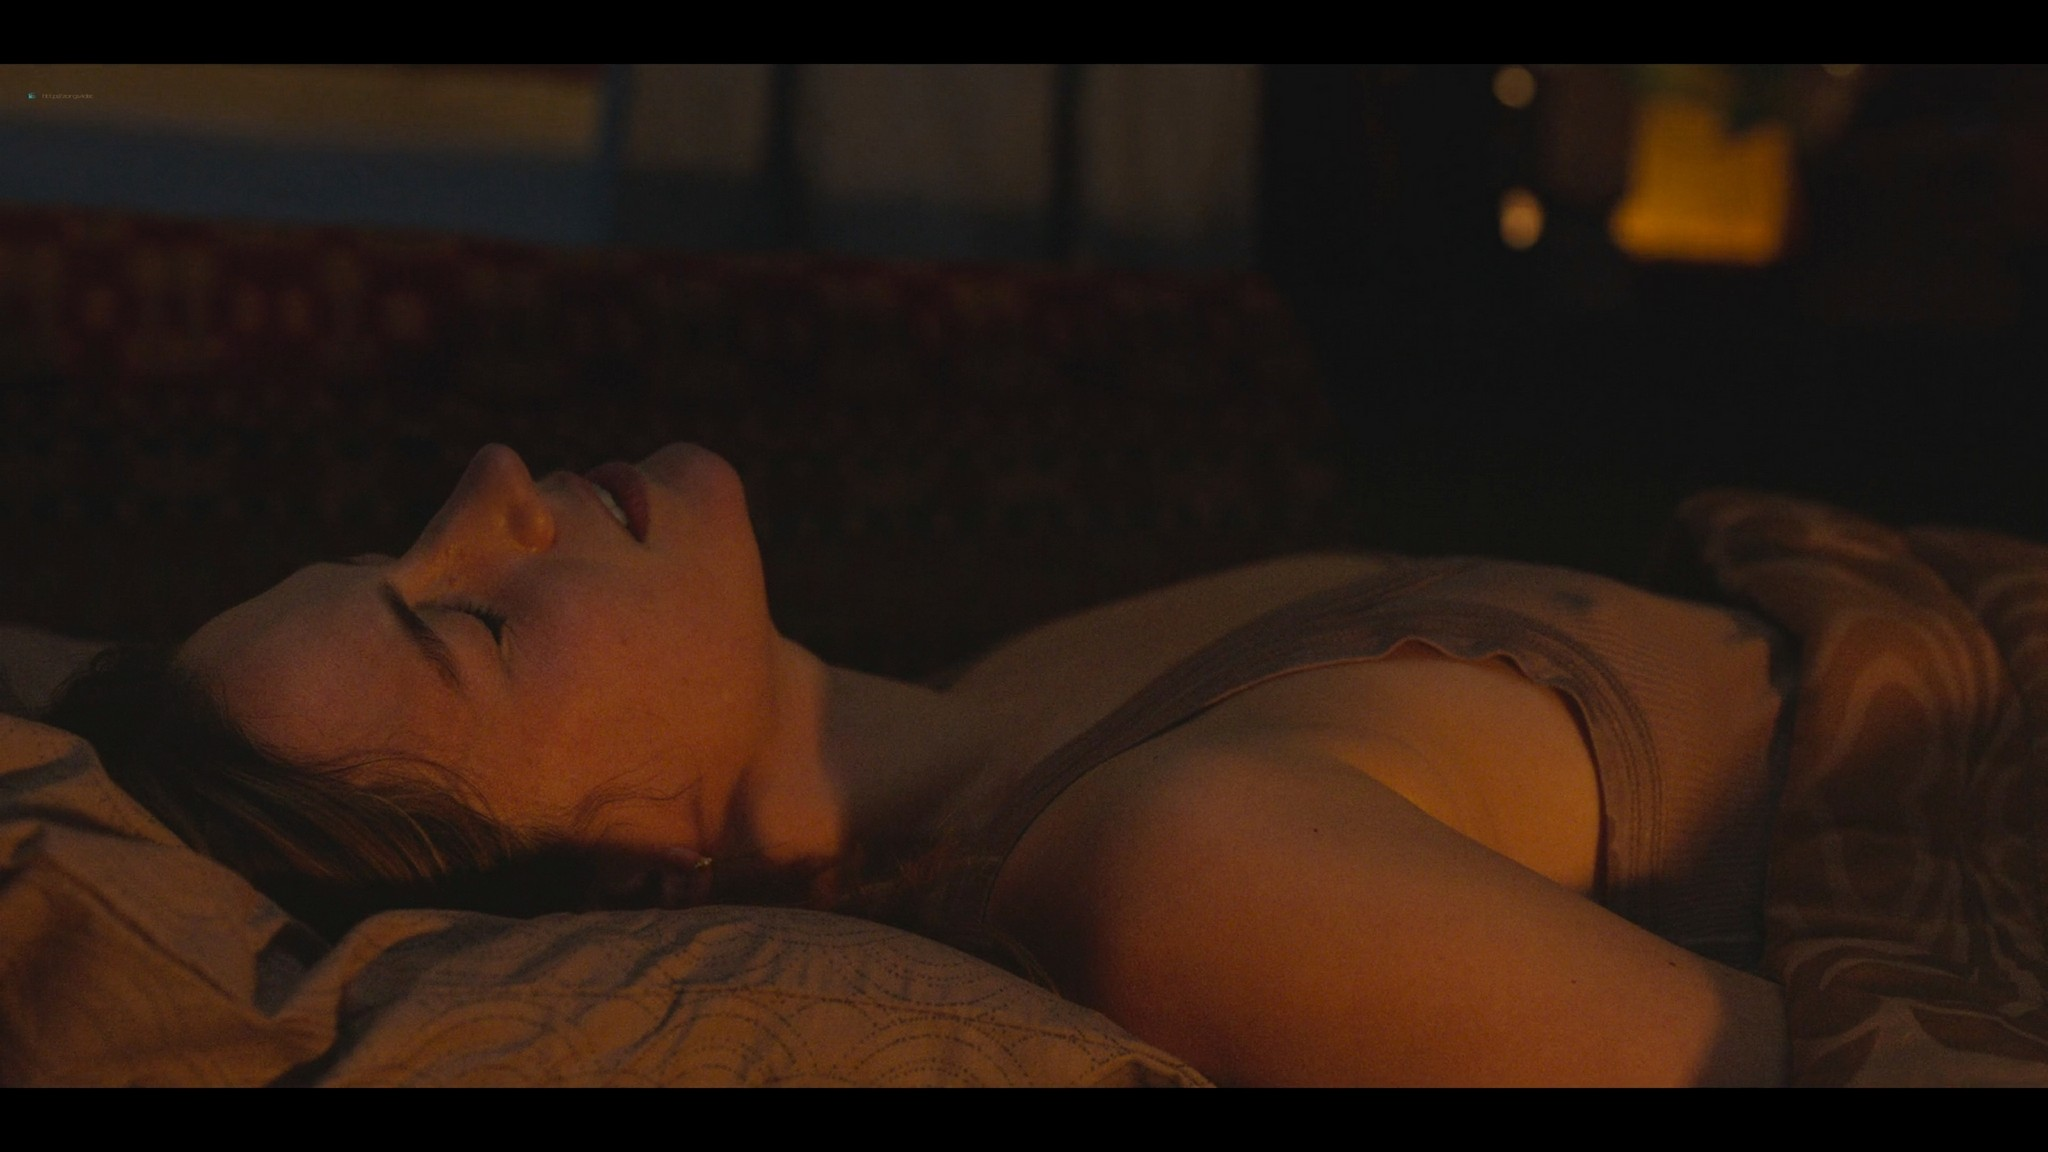 Karoline Hamm nude butt and sex Danica Curcic sexy Equinox 2020 S1 HD 1080p Web 002